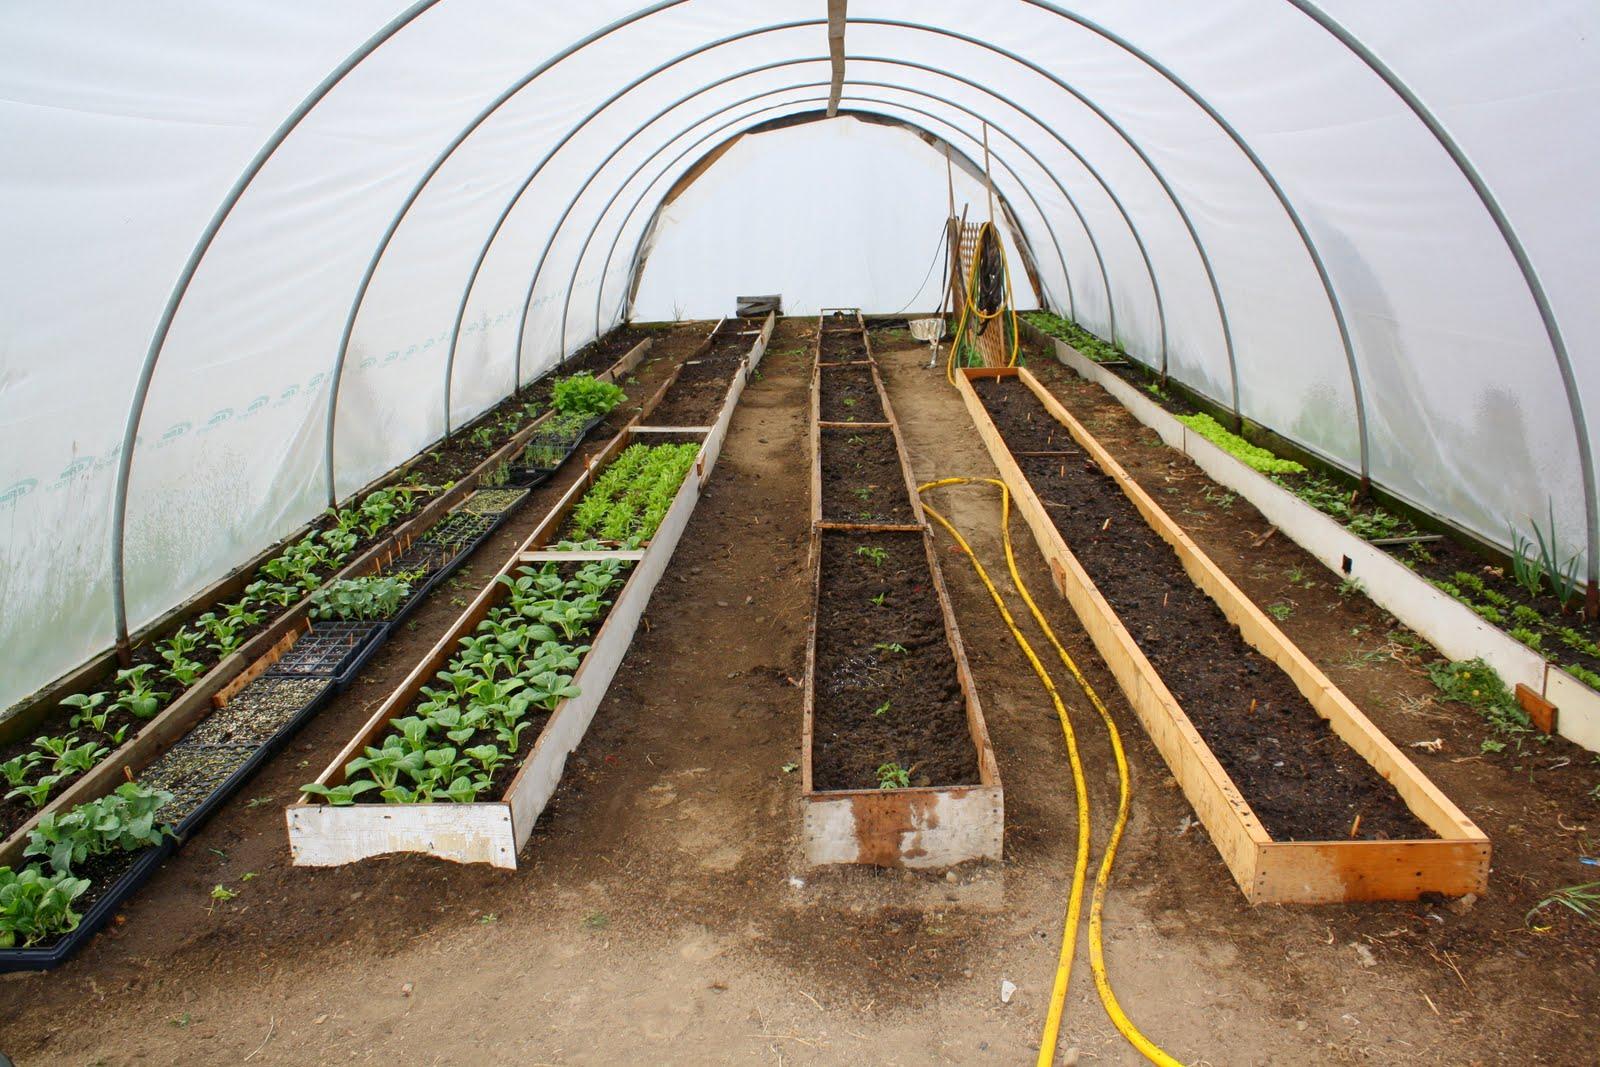 Achorn Farm: Scenes from the Green House